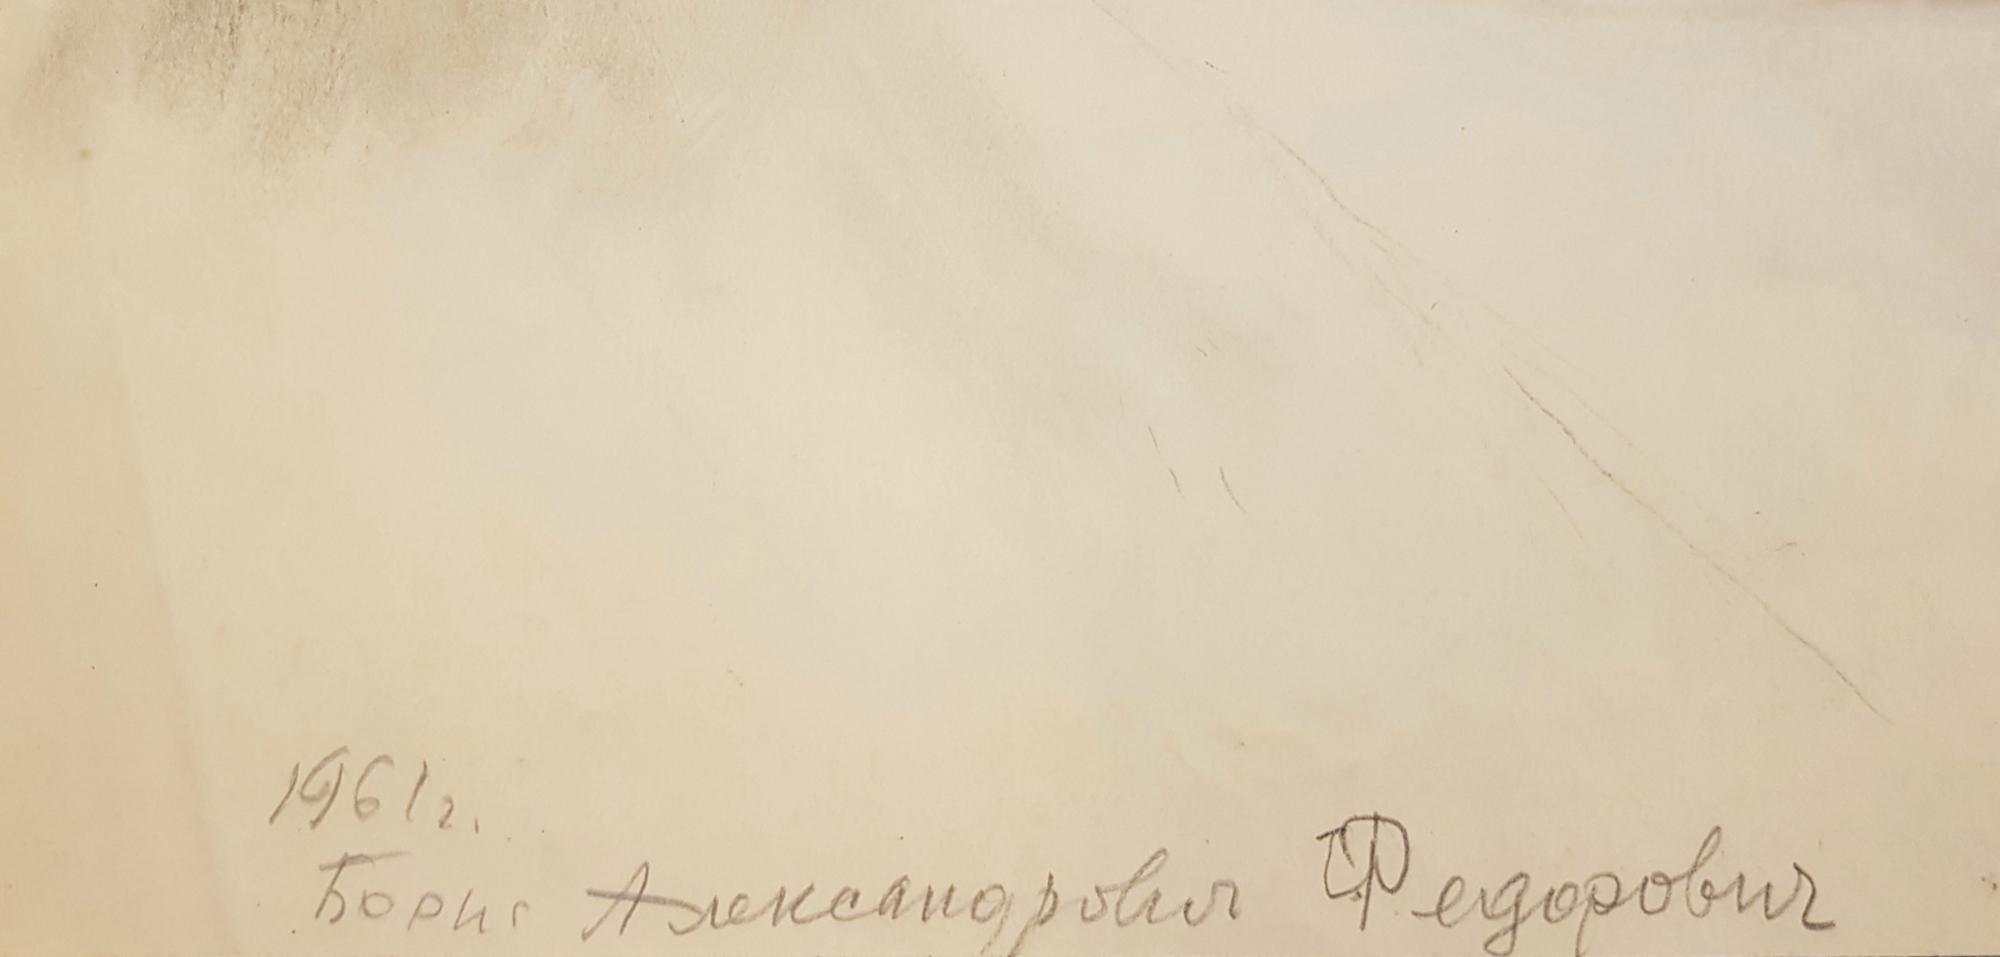 Подпись. Ванеев Петр Иванович. Портрет Бориса Александровича Федоровича